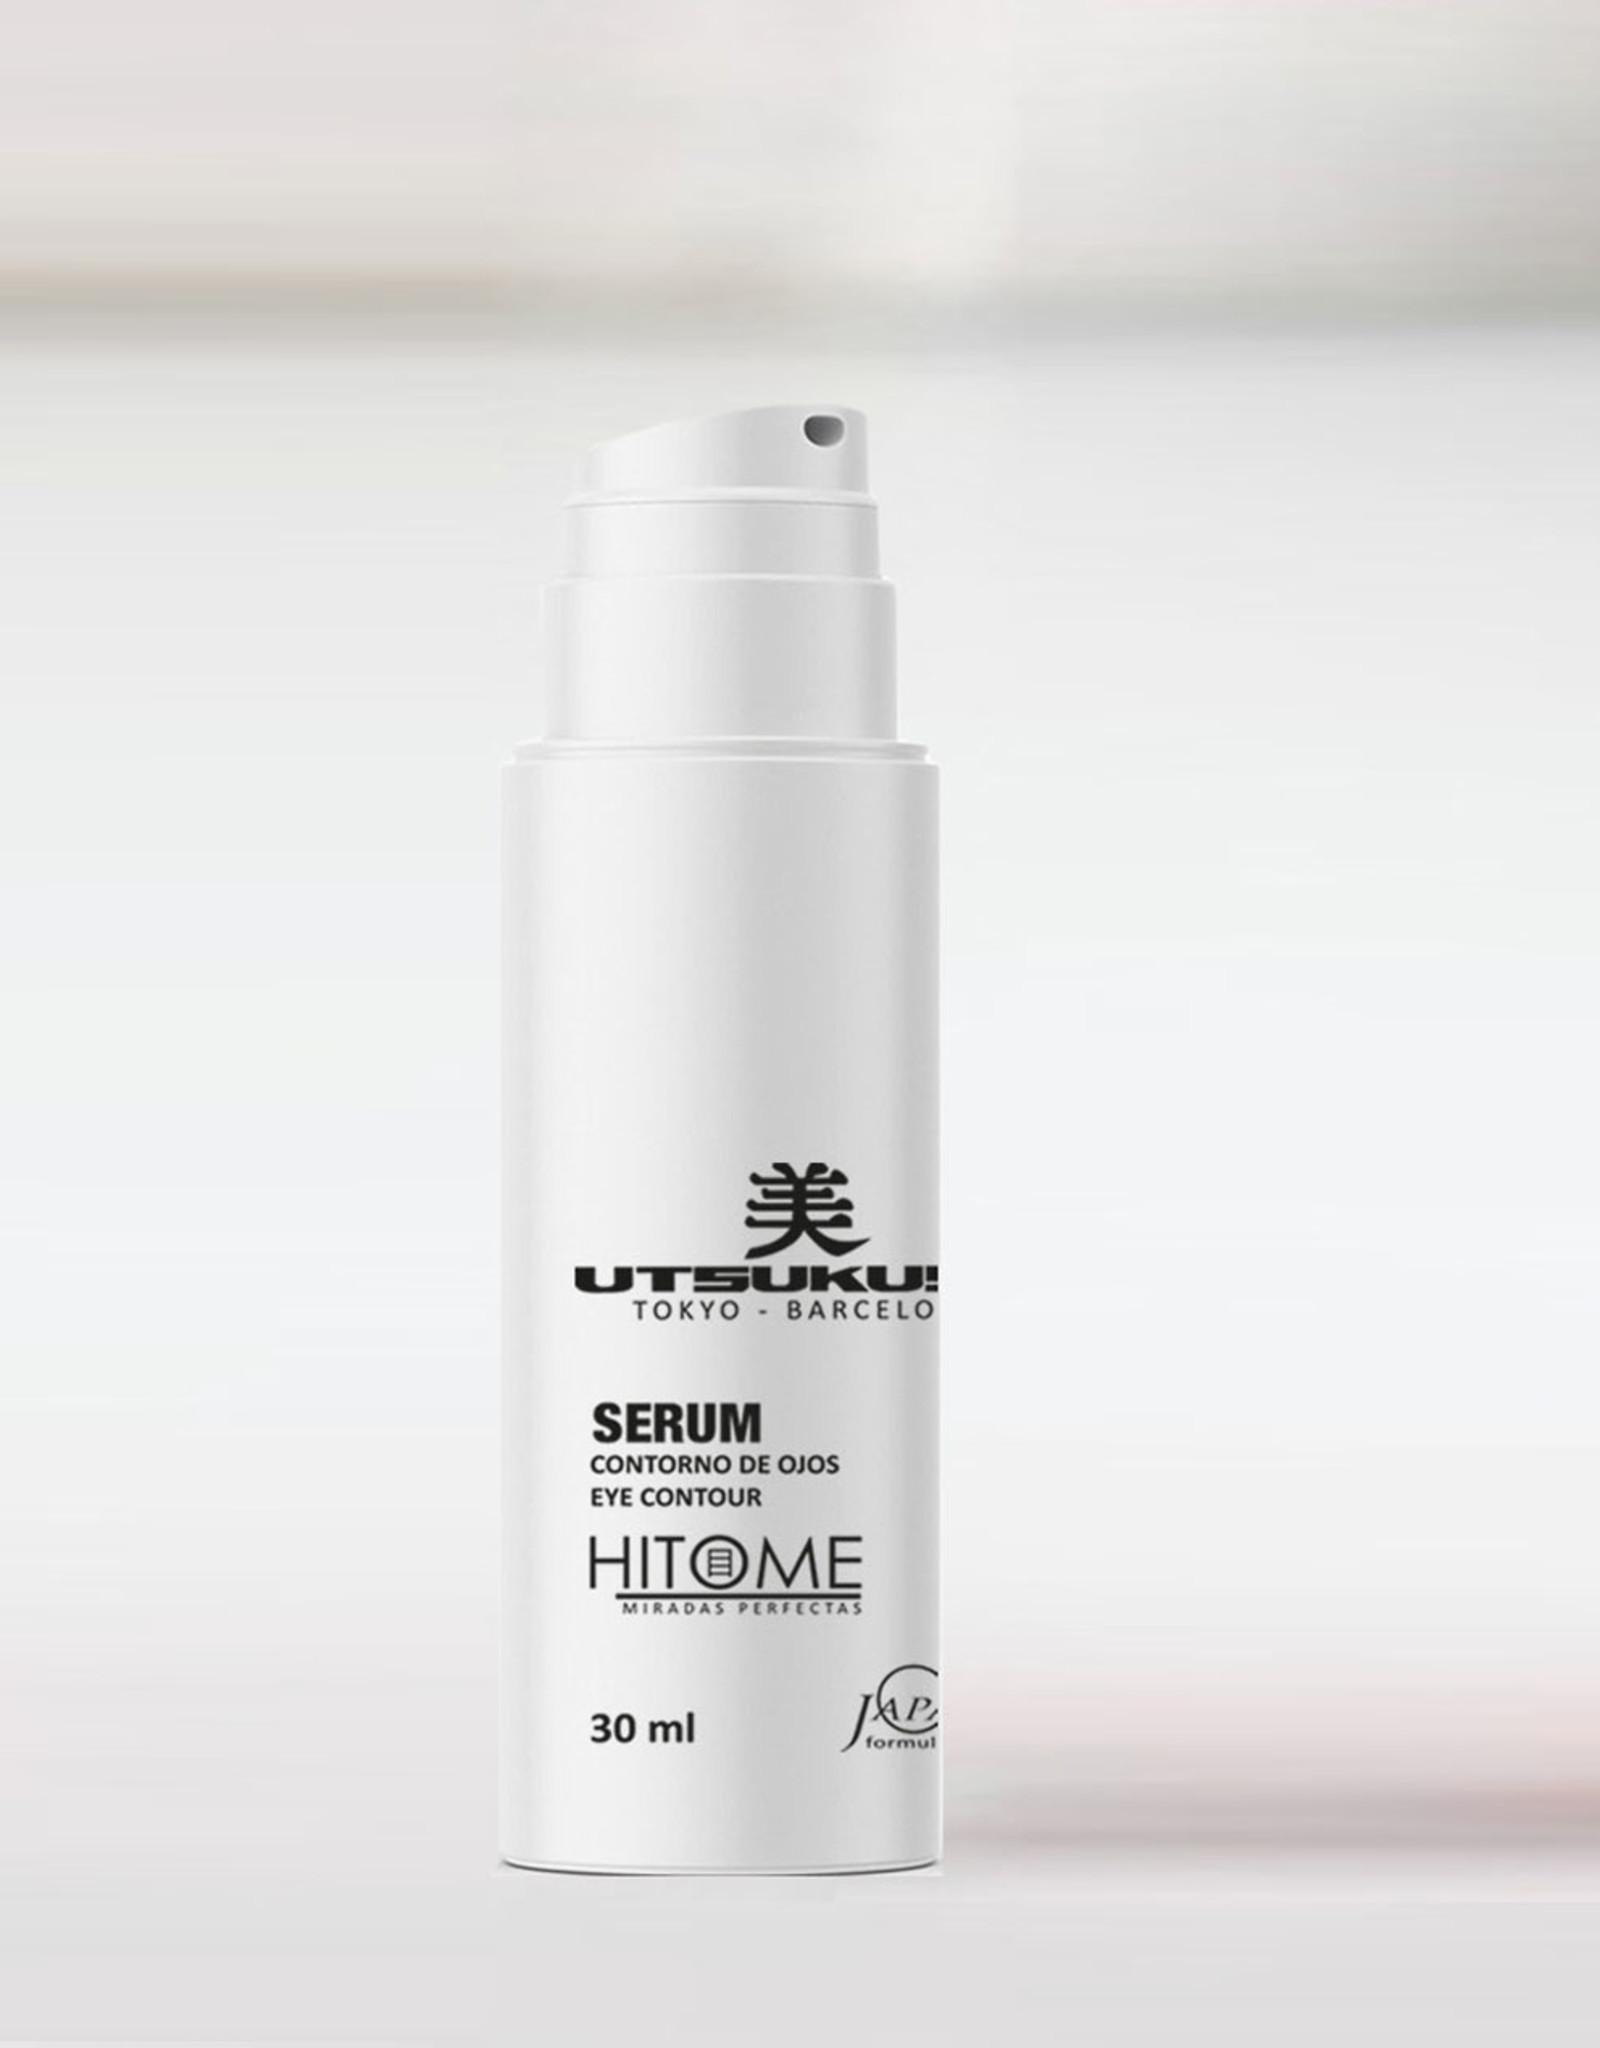 Utsukusy Hitome eye contour kit